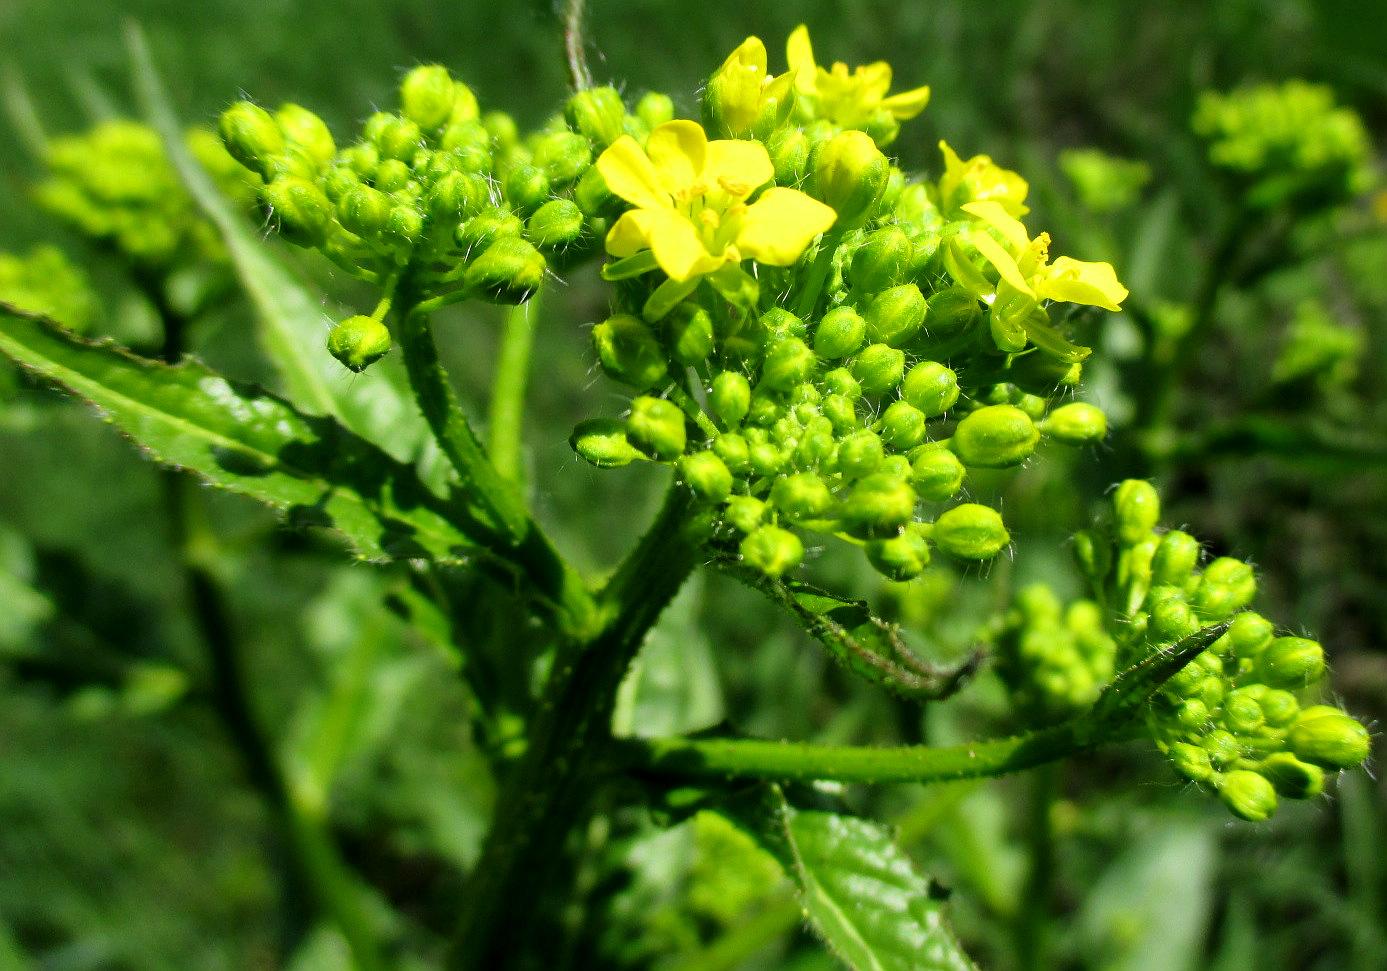 Warty cabbage - Bunias orientalis 40